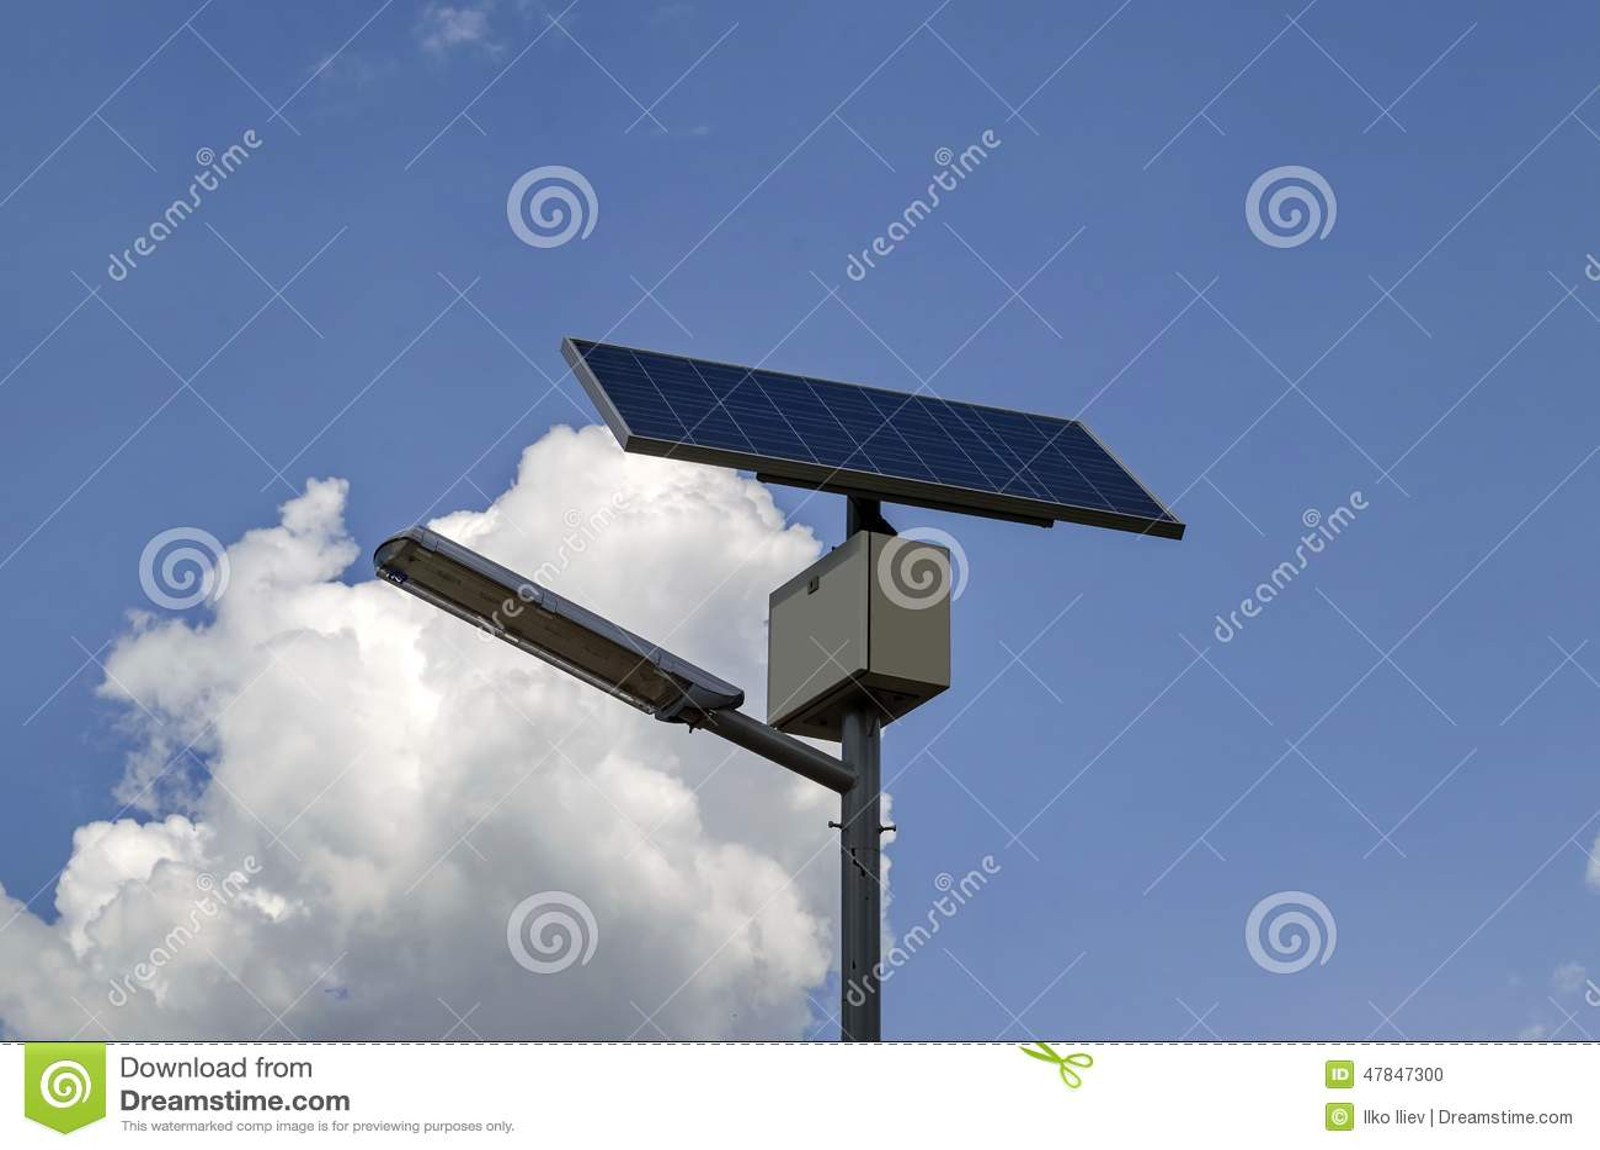 syst me d 39 clairage solaire autonome photo stock image 47847300. Black Bedroom Furniture Sets. Home Design Ideas